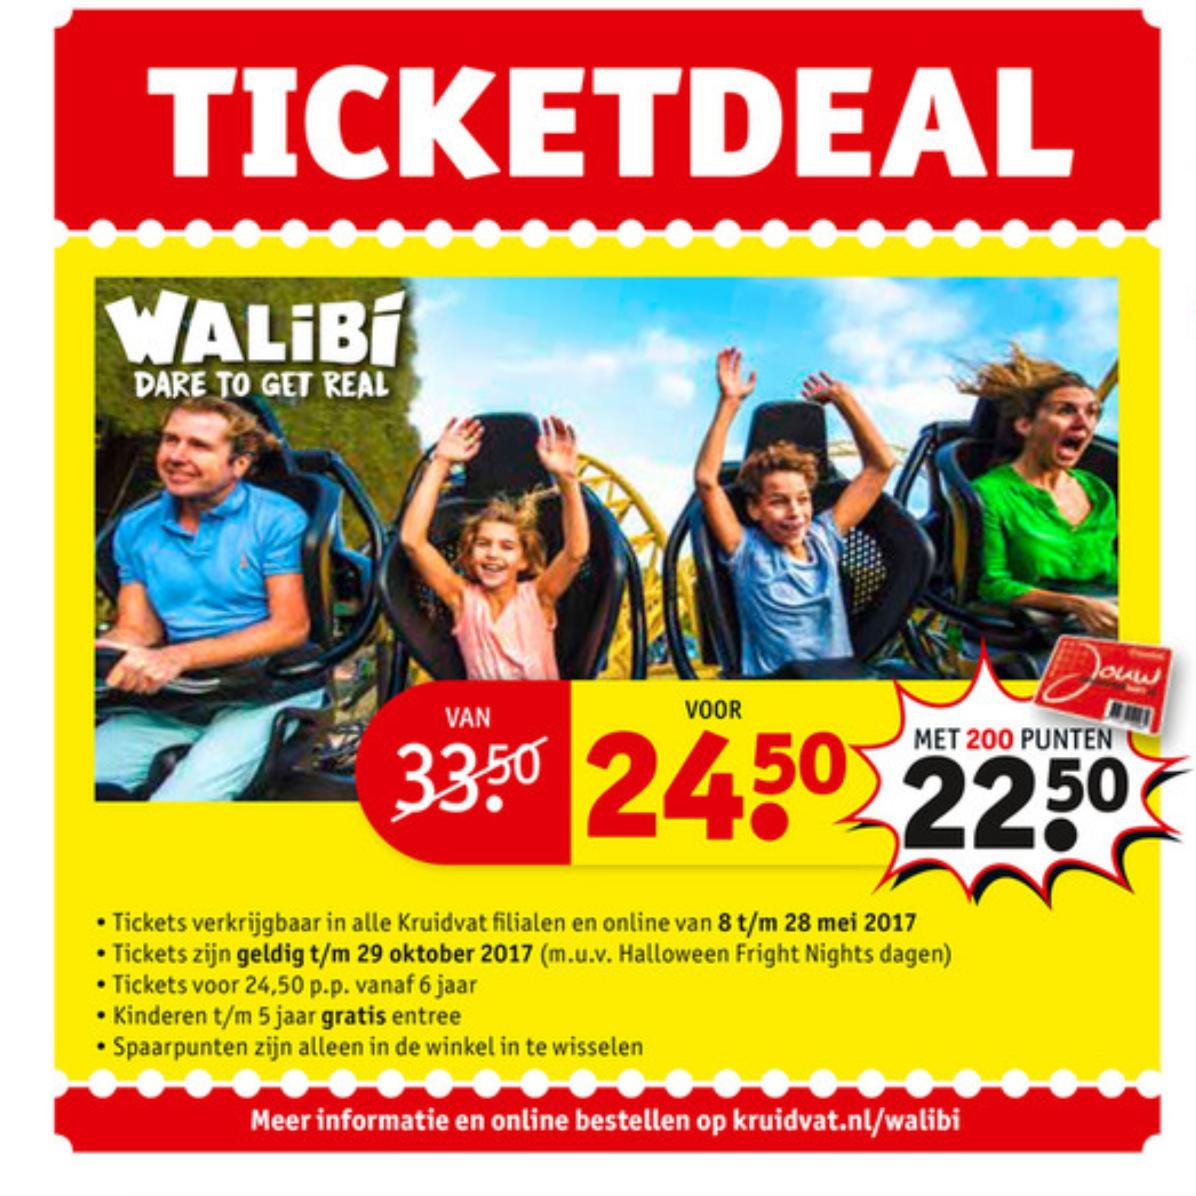 Tickets Walibi - €24,50 (€22,50 met 200 punten) @ Kruidvat